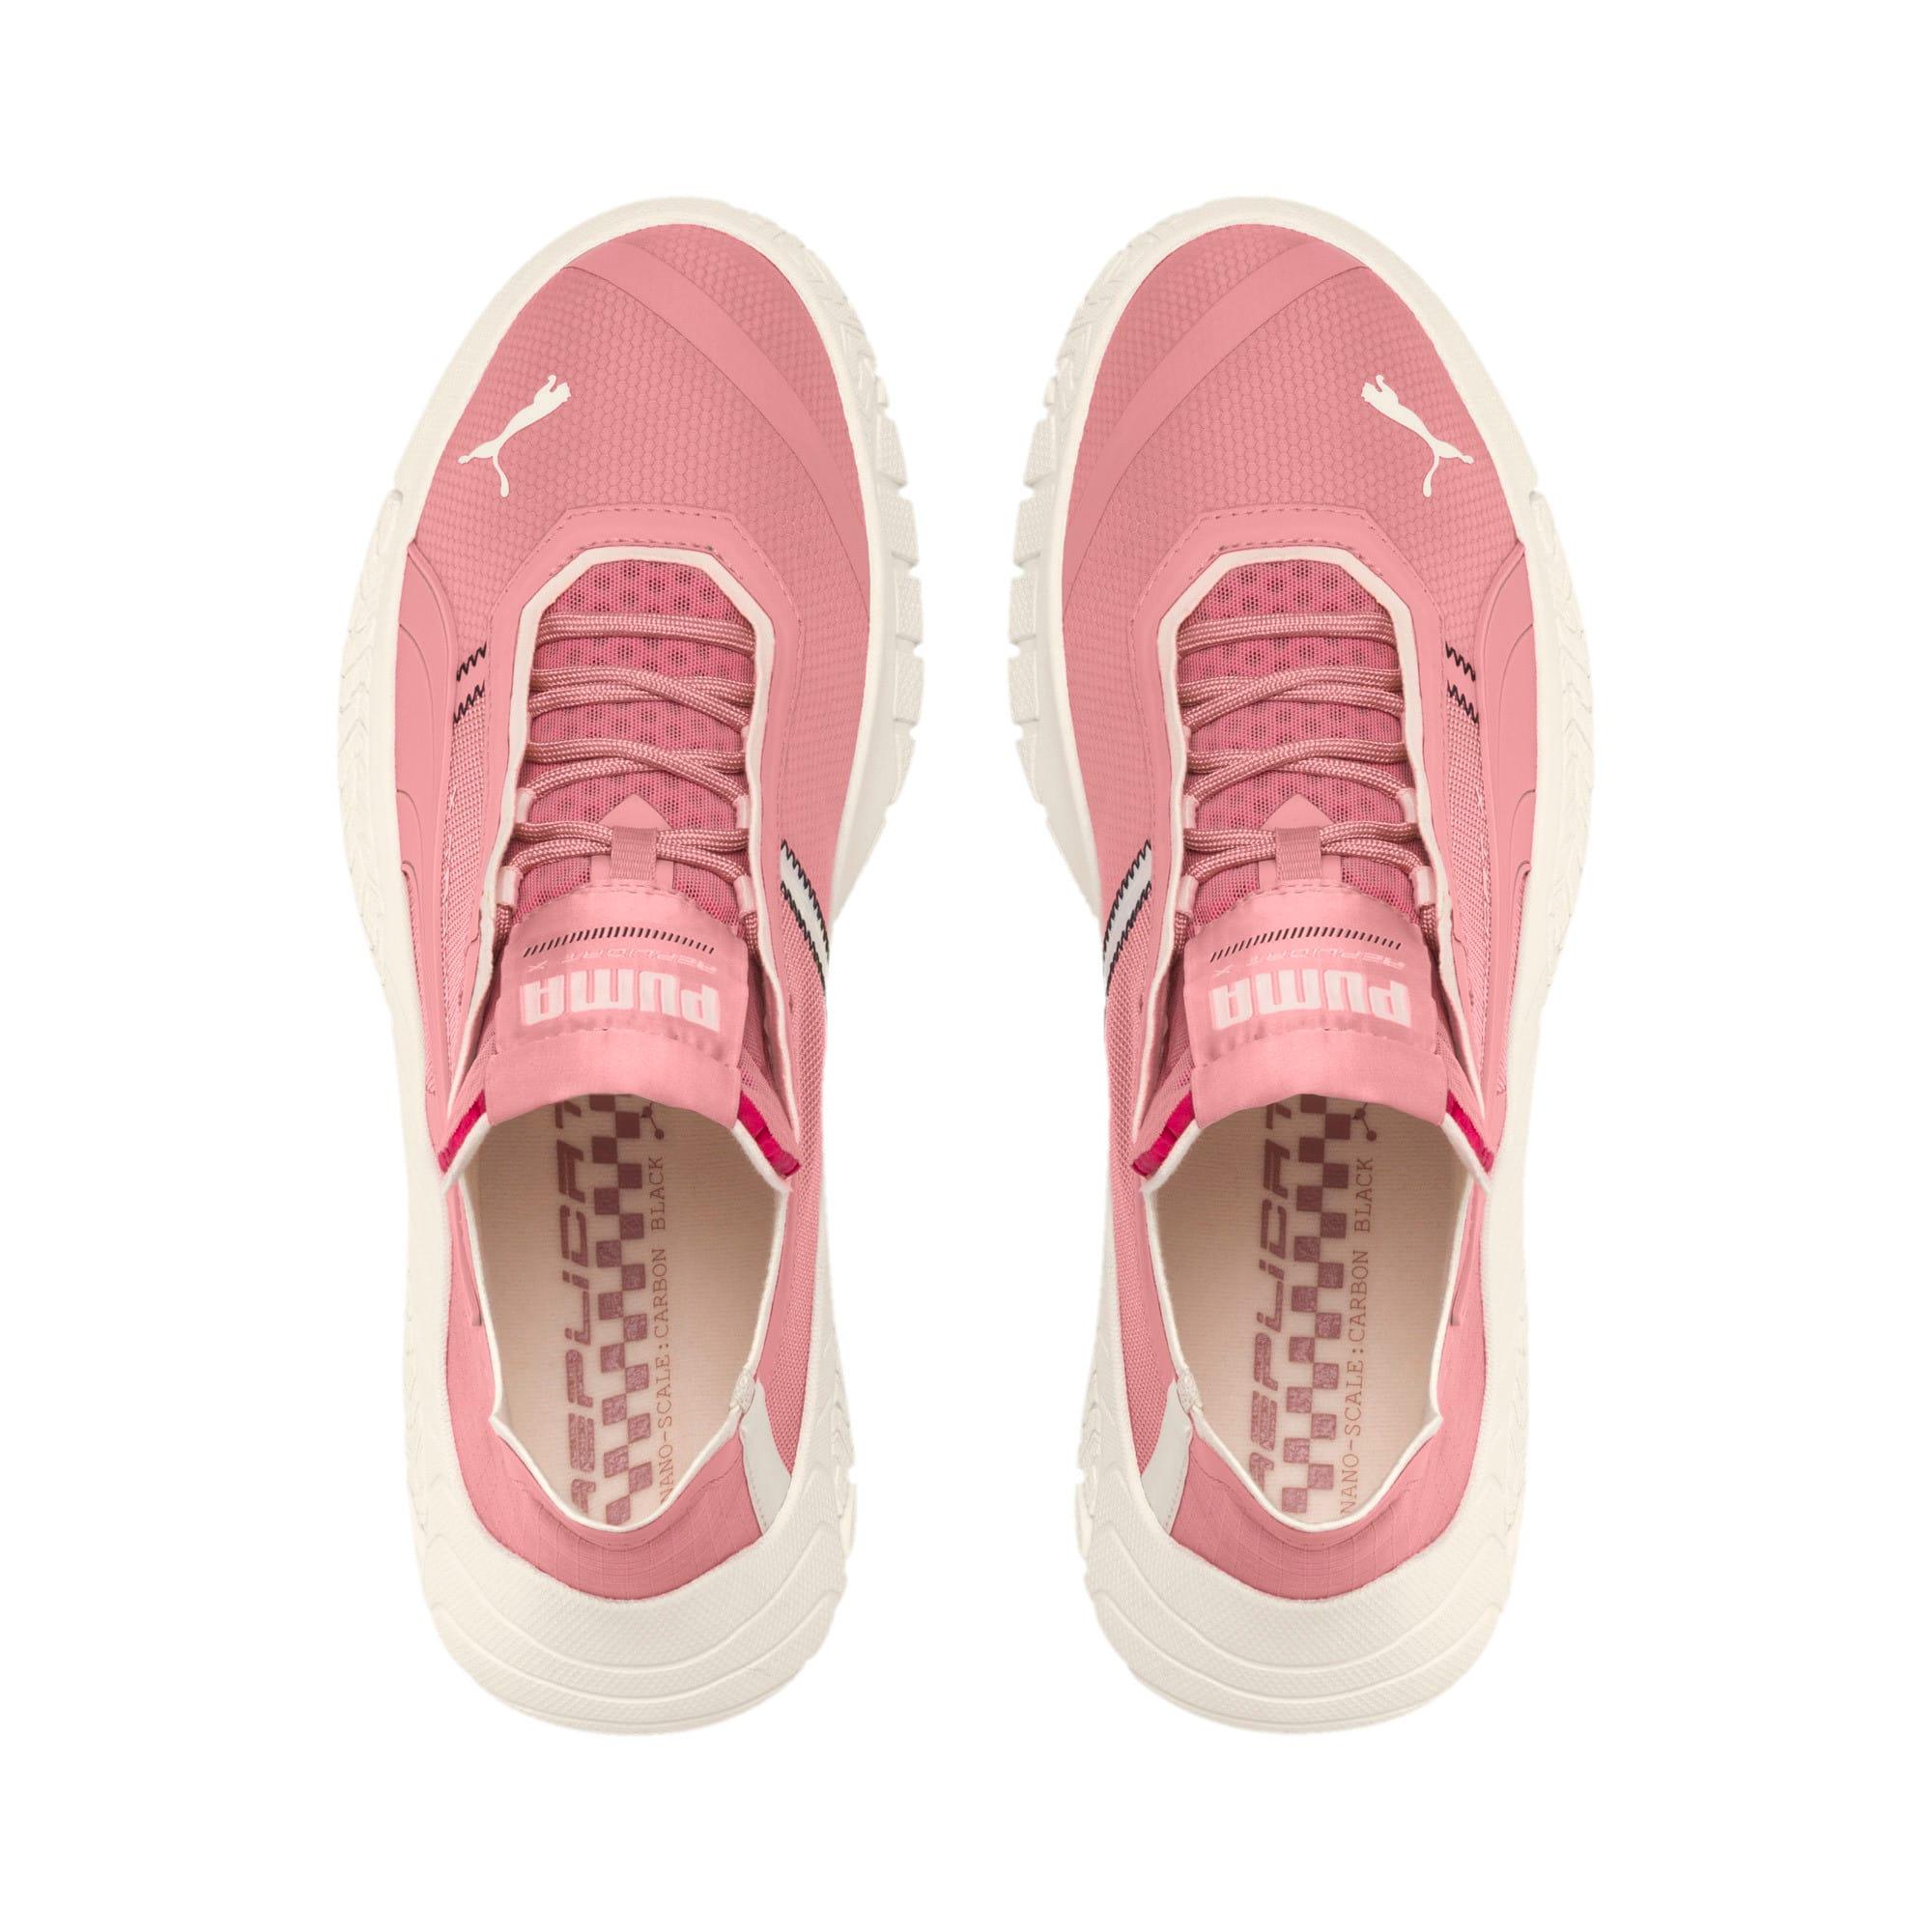 Thumbnail 6 of Replicat-X Circuit Motorsport Shoes, Bridal Rose-Whisper White, medium